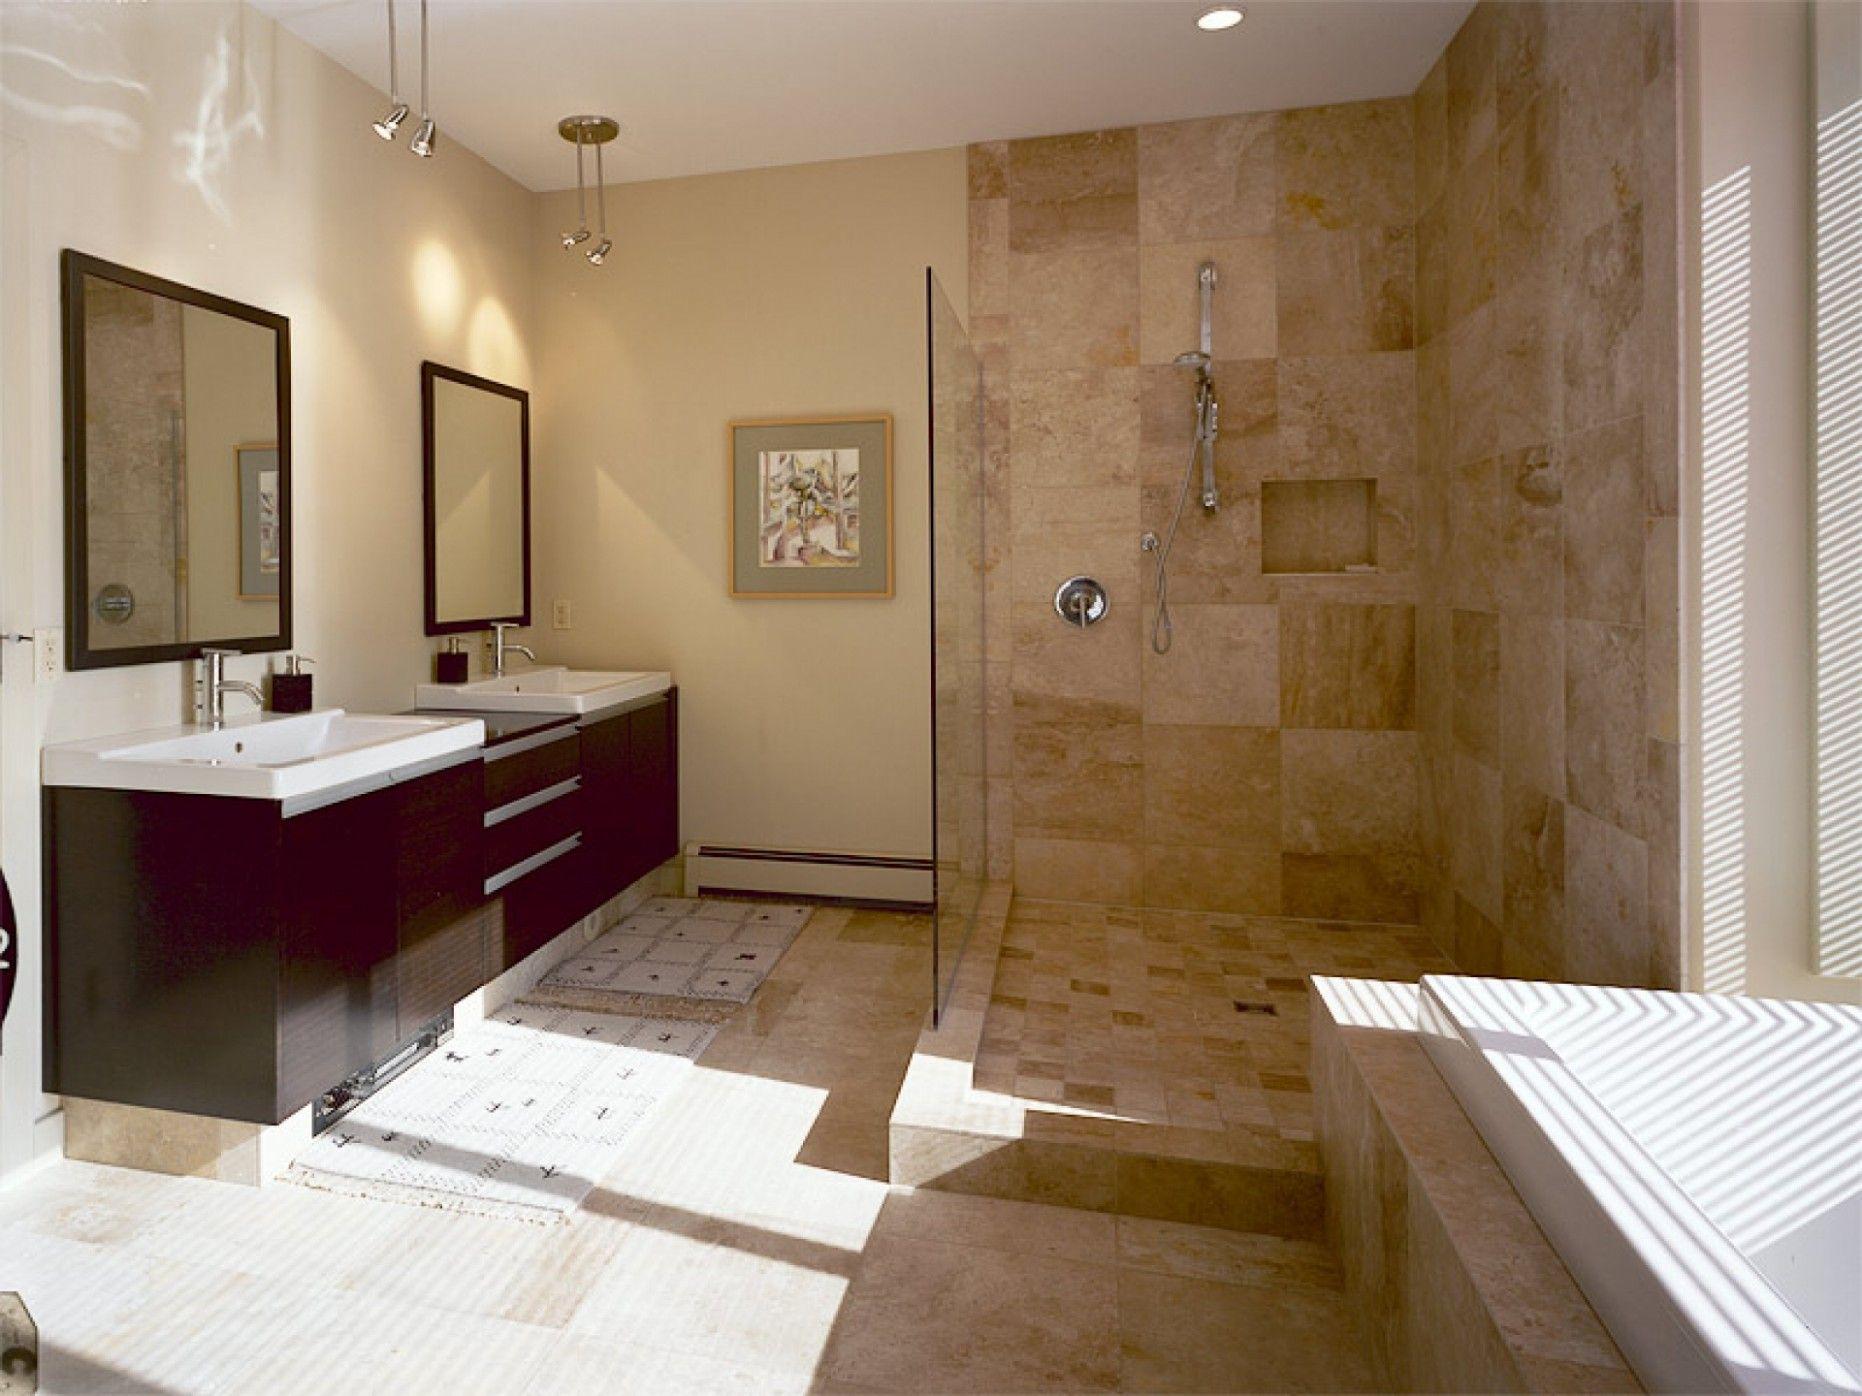 small ensuite bathroom design nz on bathroom renovation ideas nz id=78584